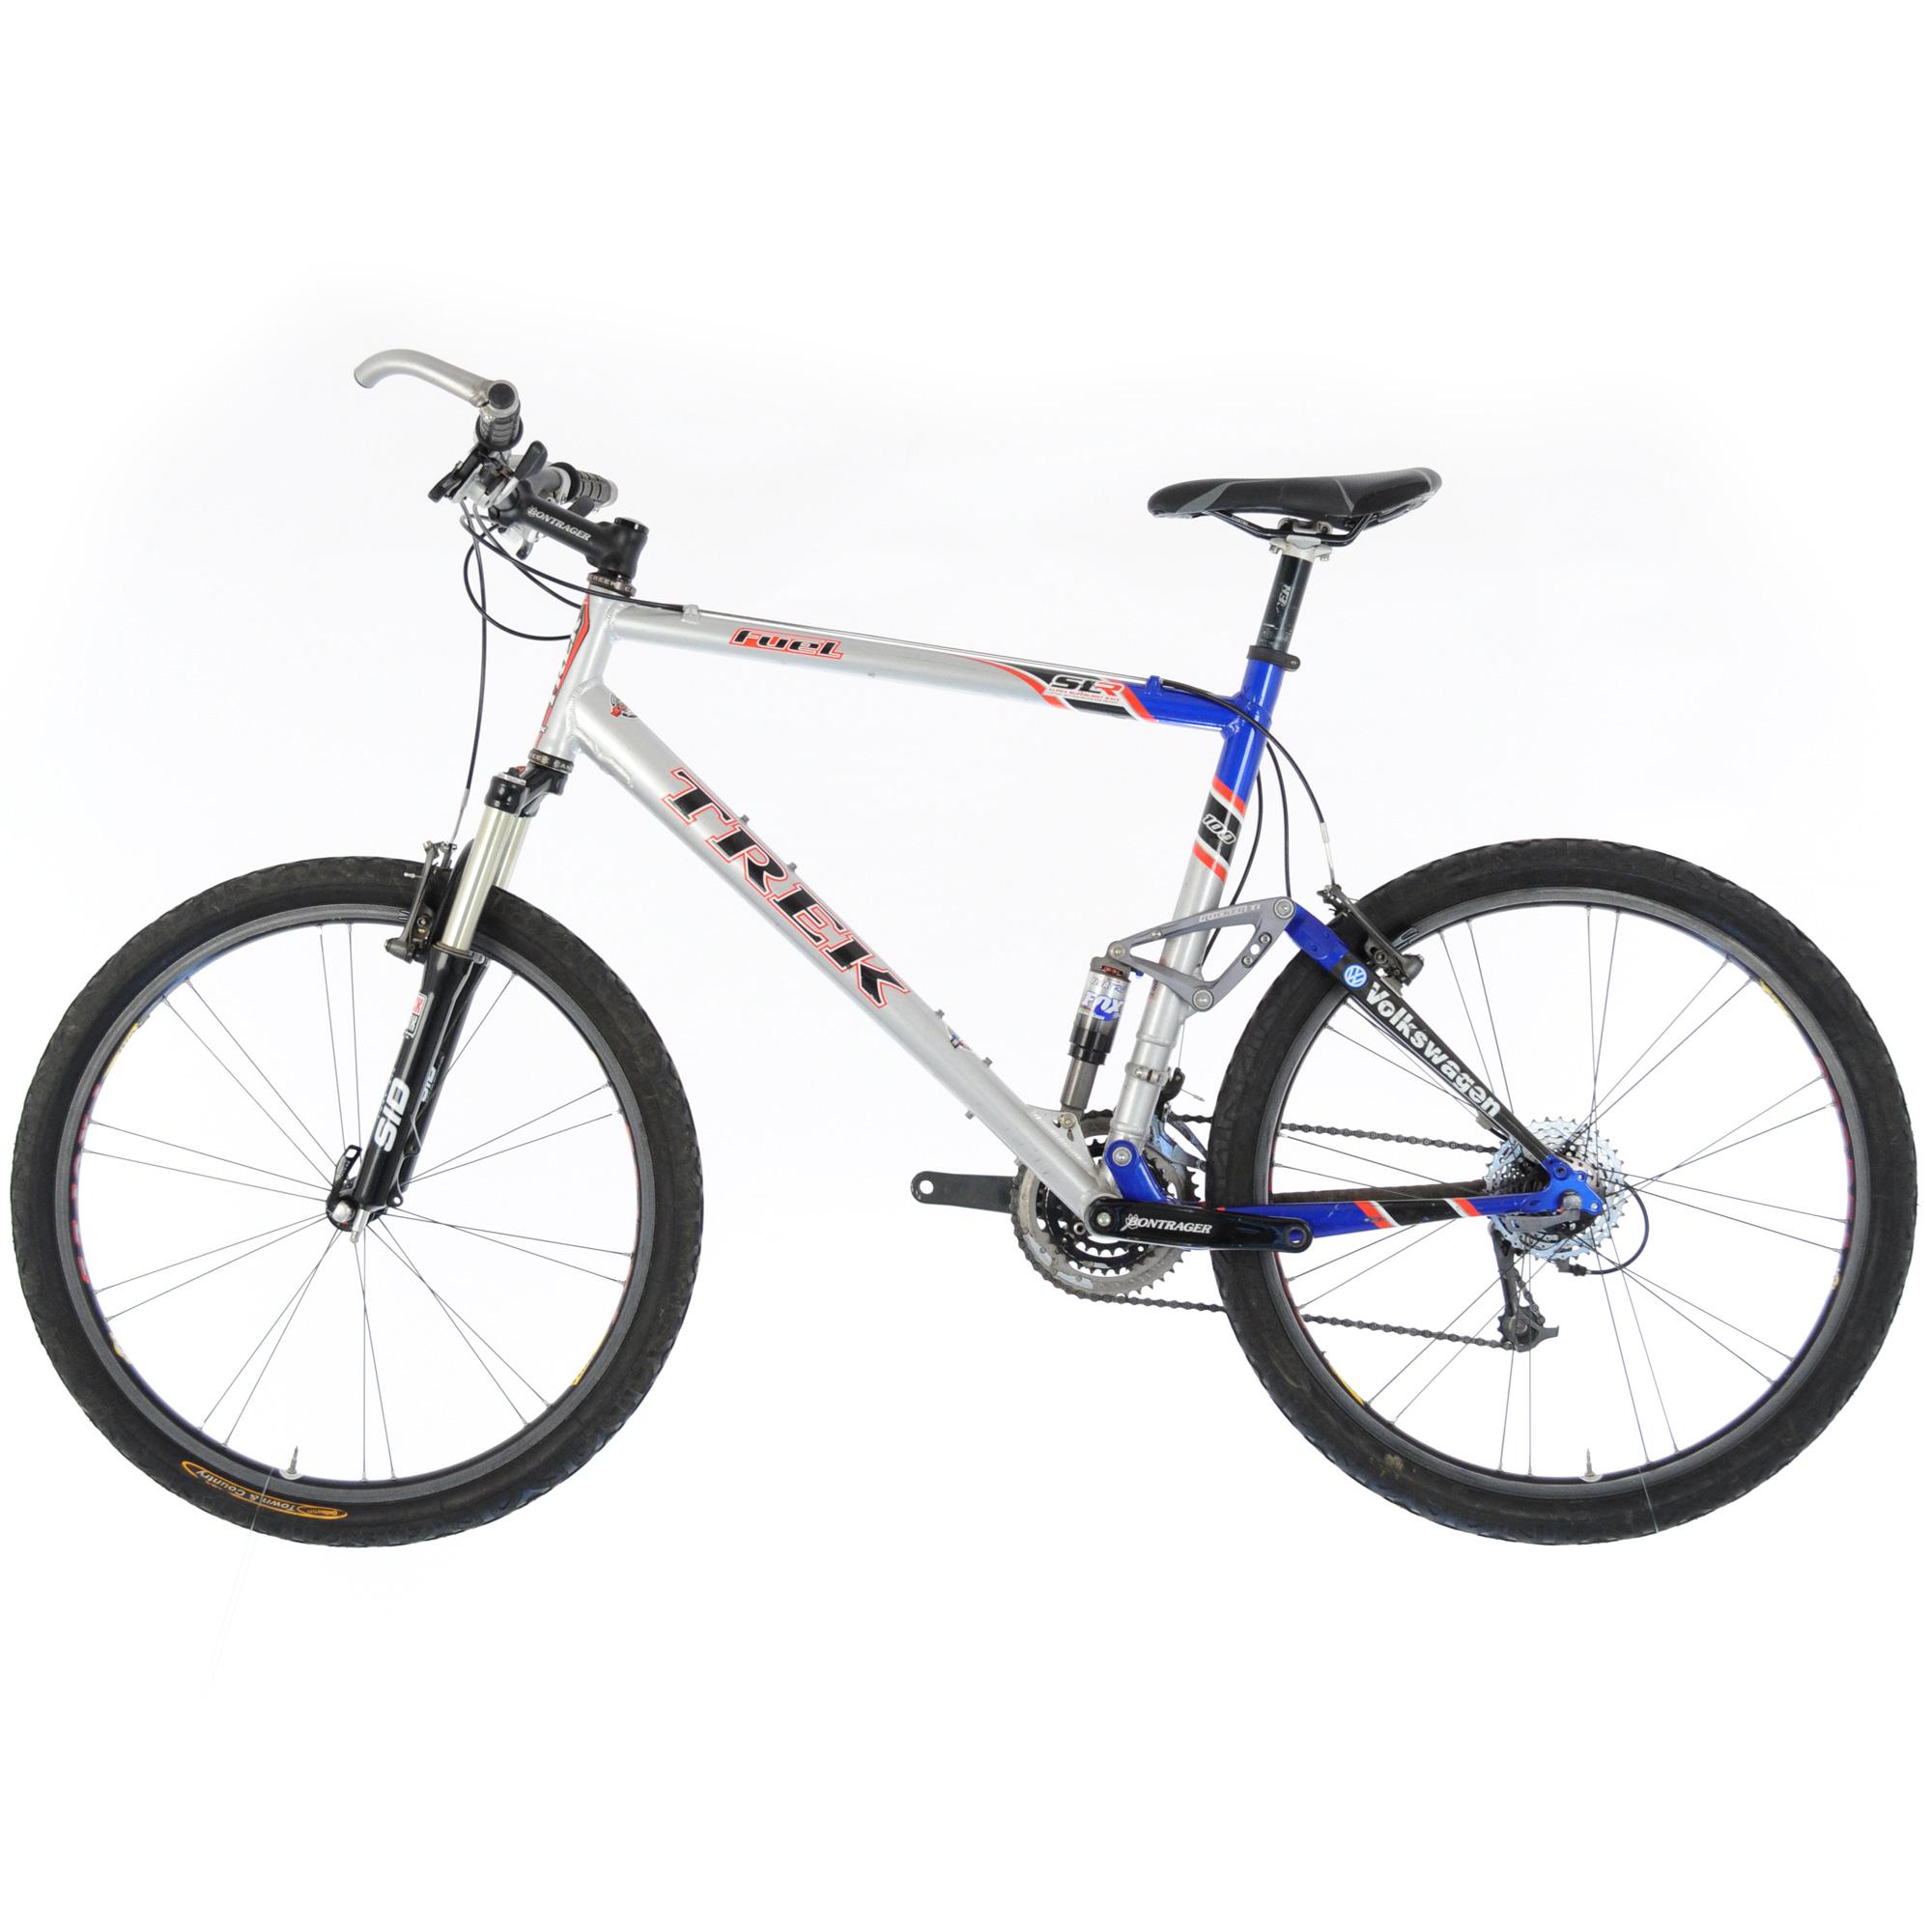 Trek Fuel 100 Full Suspension Mountain Bike 21 5